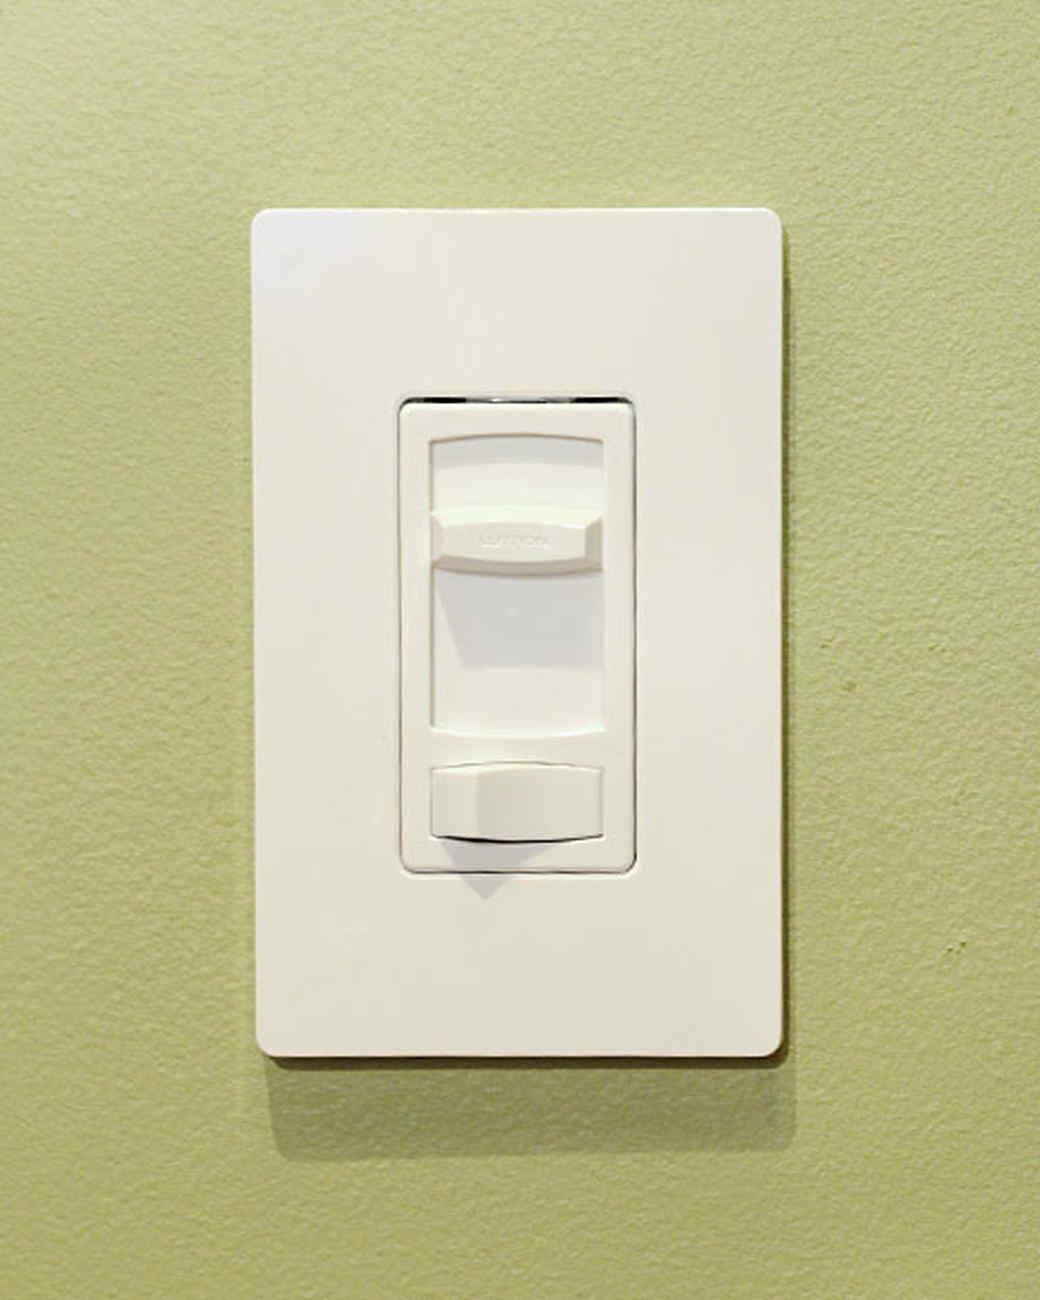 installing a dimmer - Dimmer Light Switch